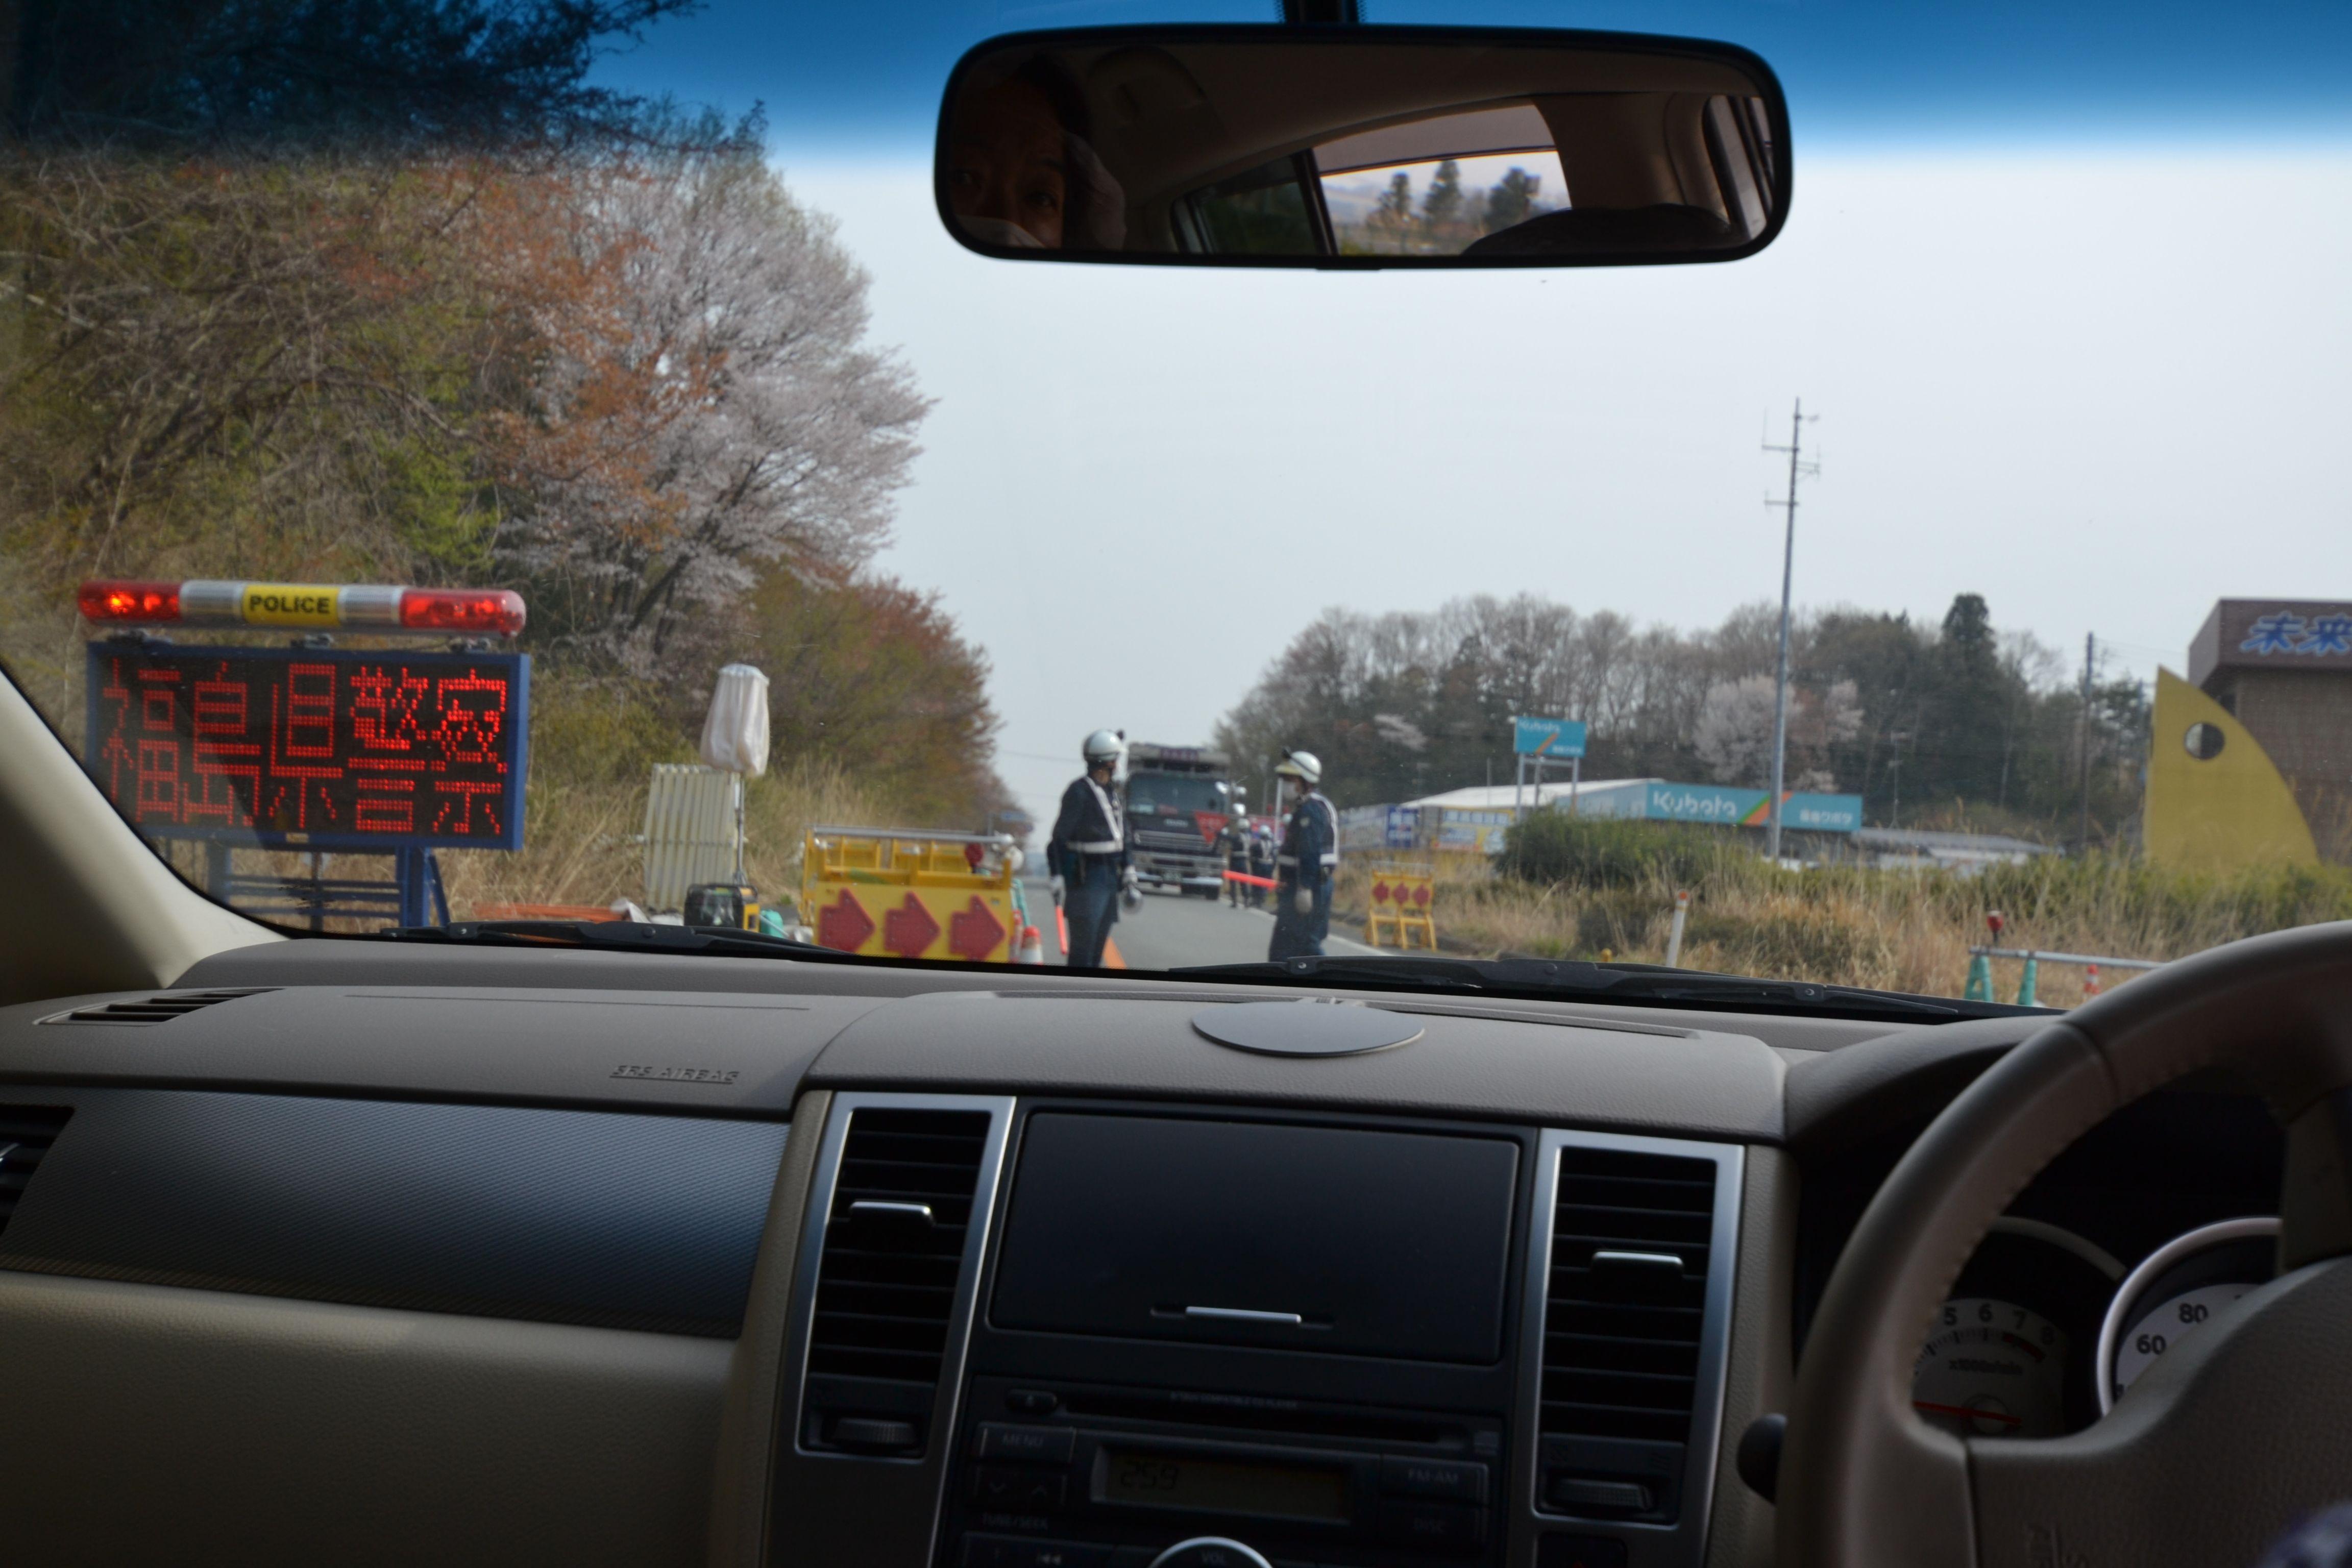 Fukushima barricade stop from car int.jpg